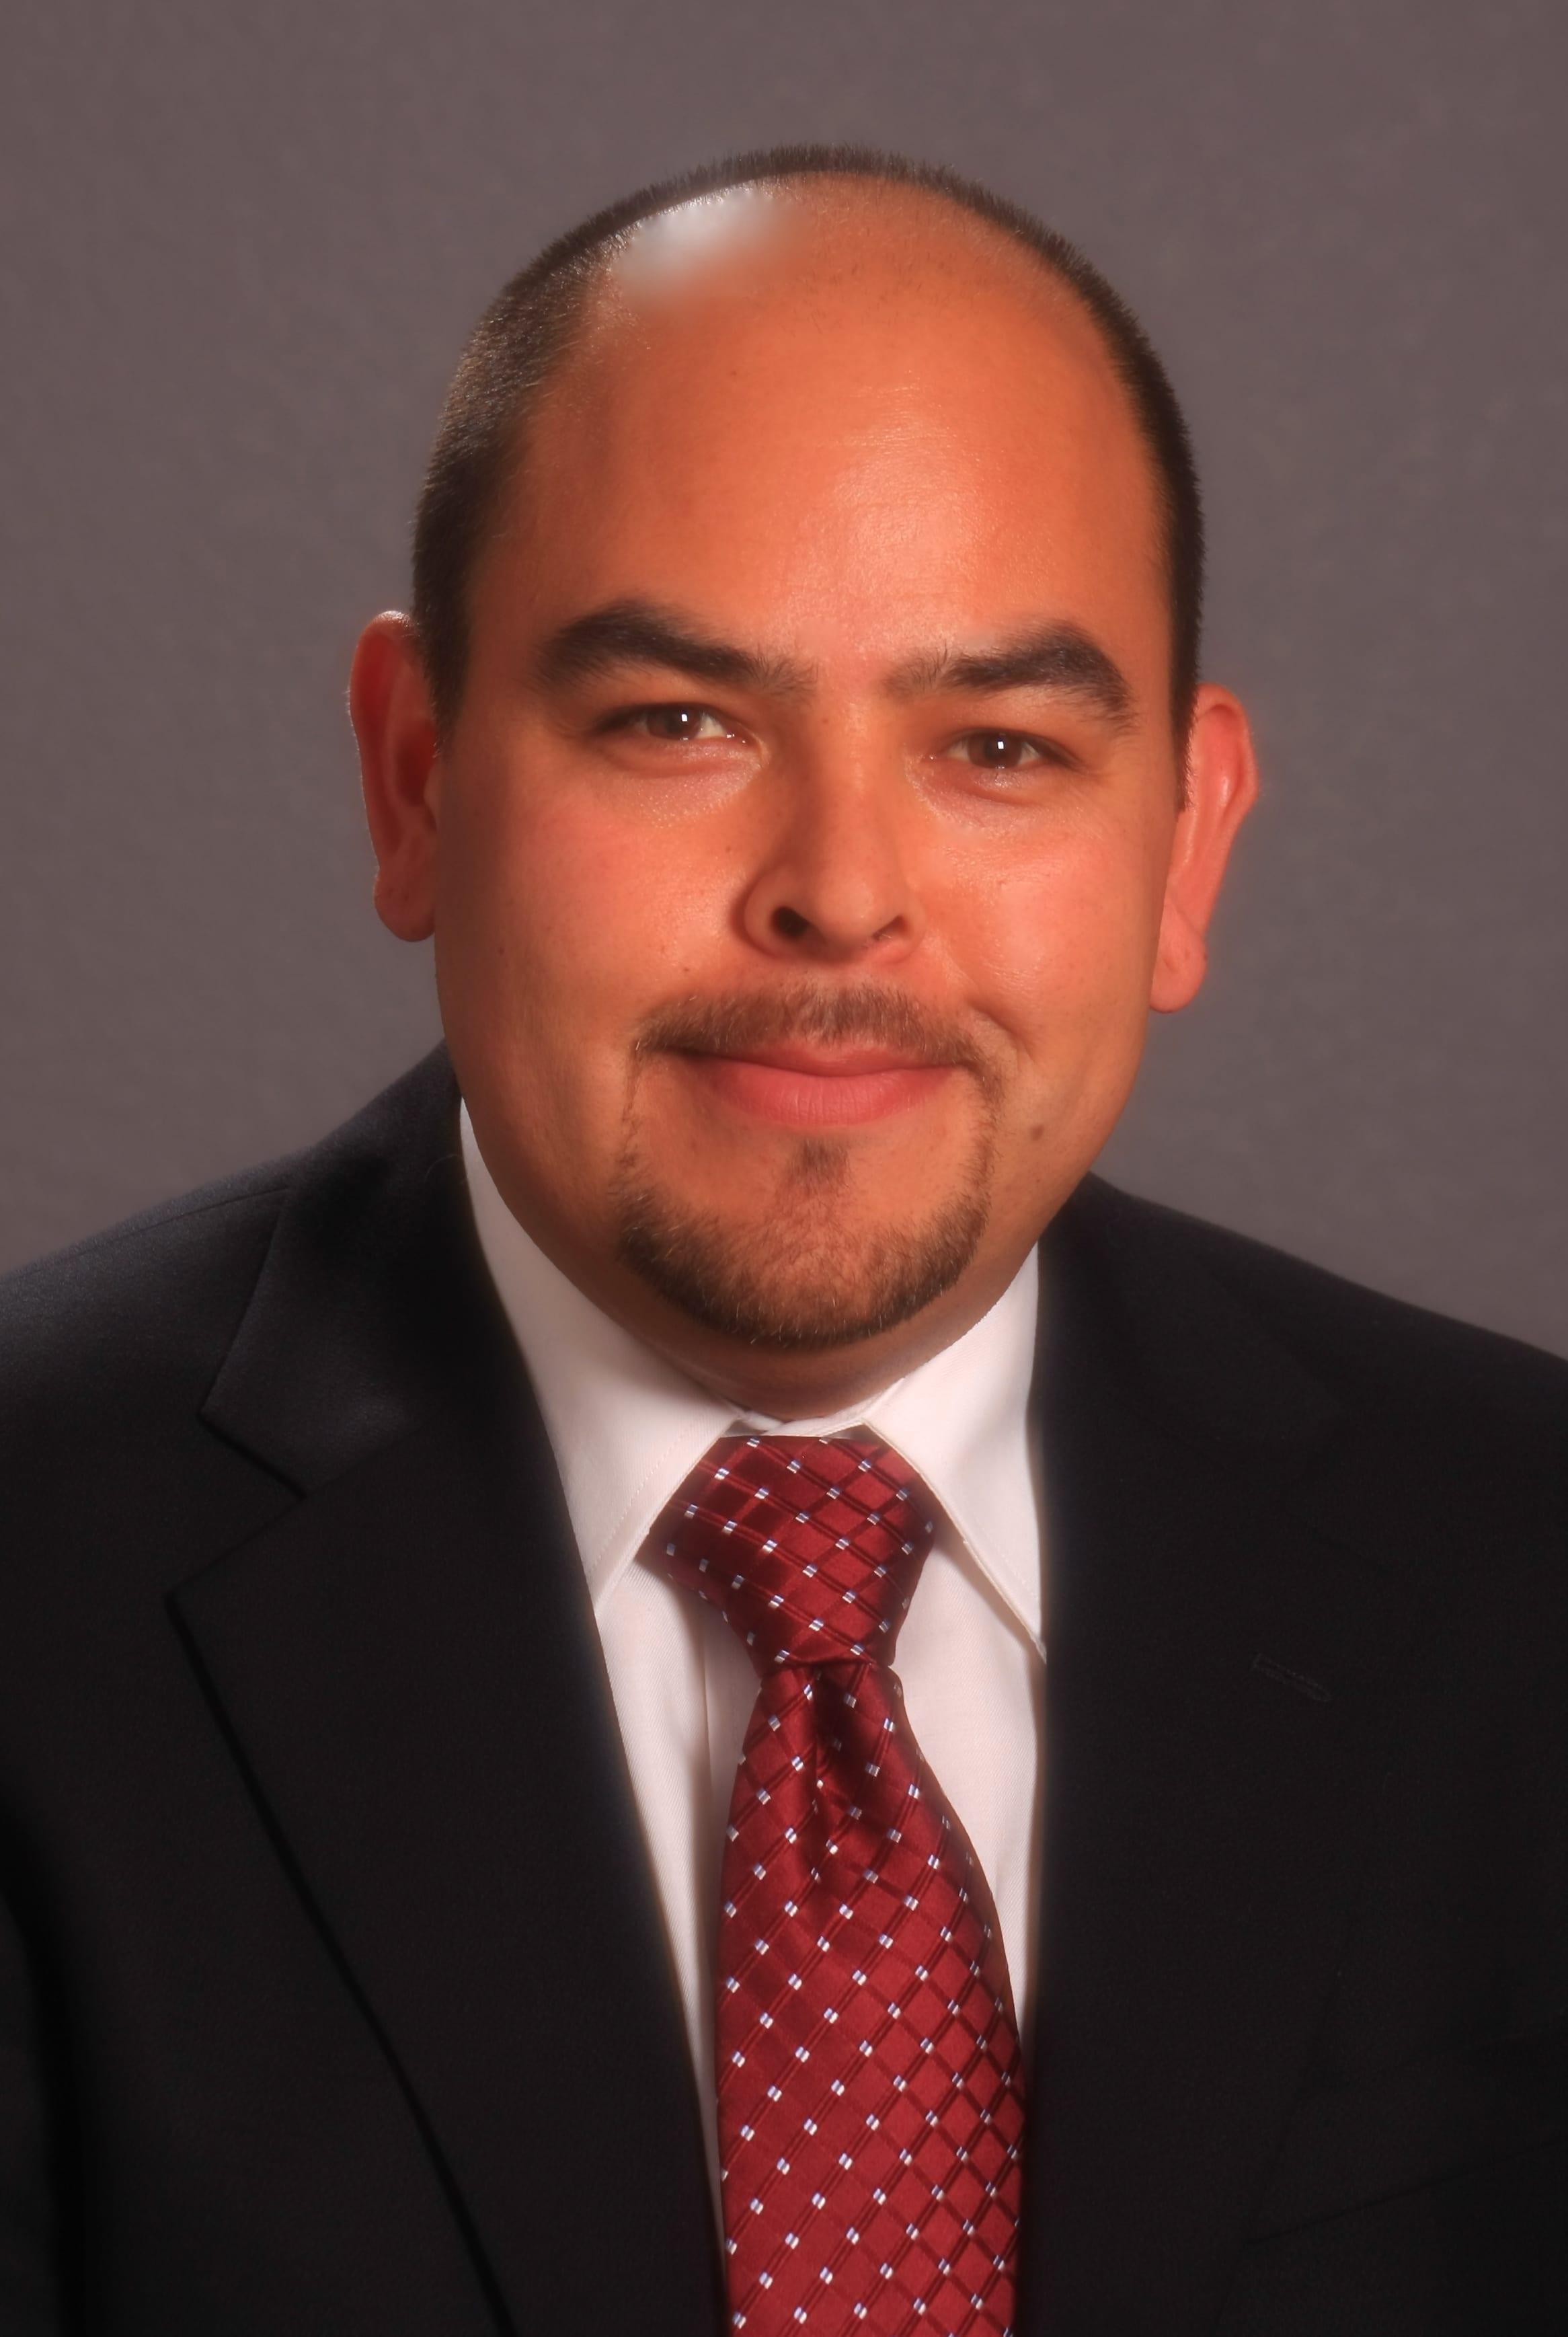 Jason Aviles